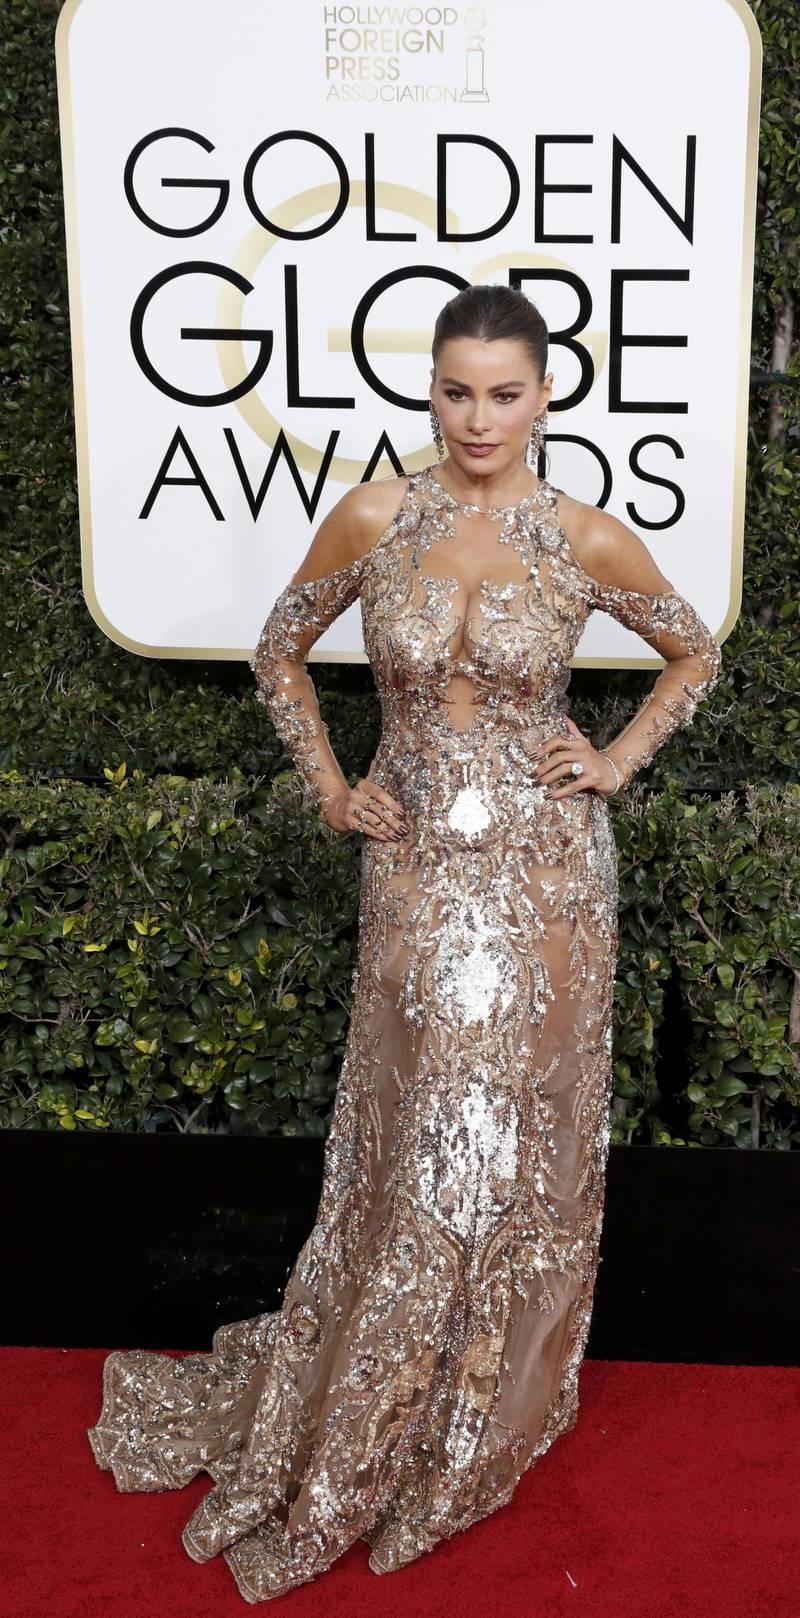 epa05706076 Sofia Vergara arrives for the 74th annual Golden Globe Awards ceremony at the Beverly Hilton Hotel in  Beverly Hills, California, USA, 08 January 2017.  EPA/PAUL BUCK